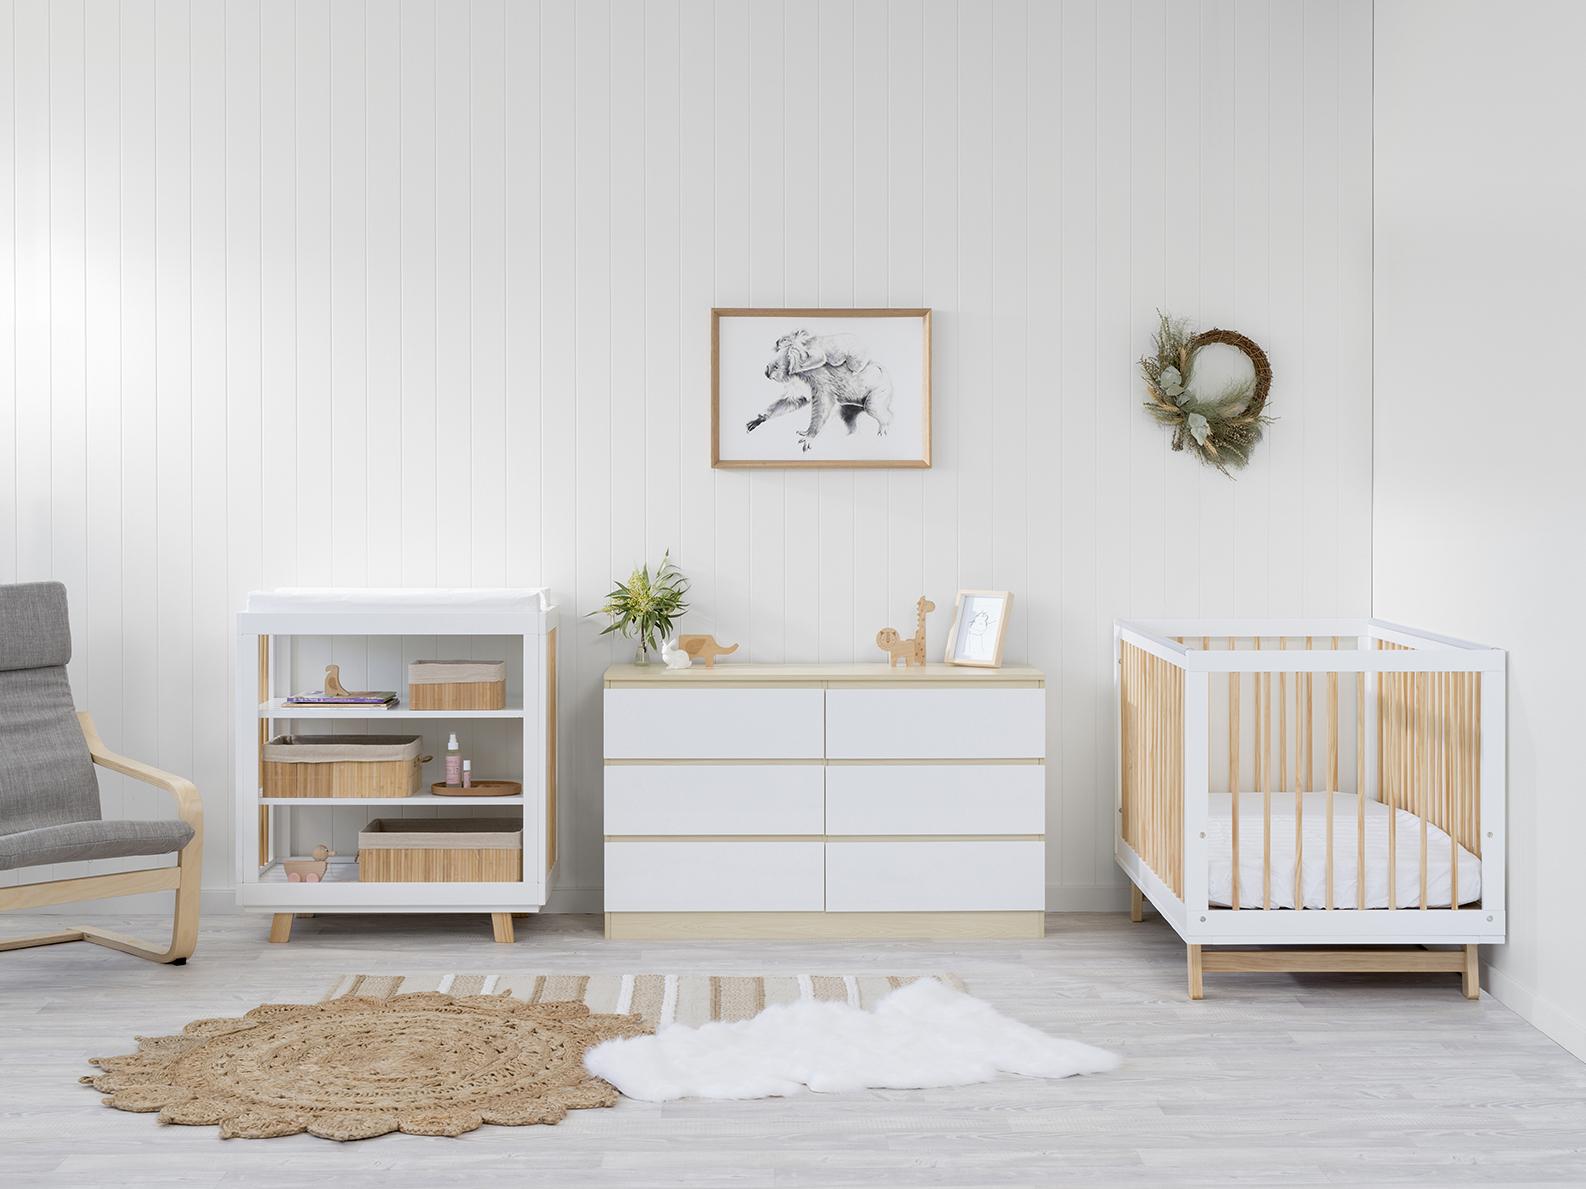 Aspen Upgrade Nursery Furniture Package